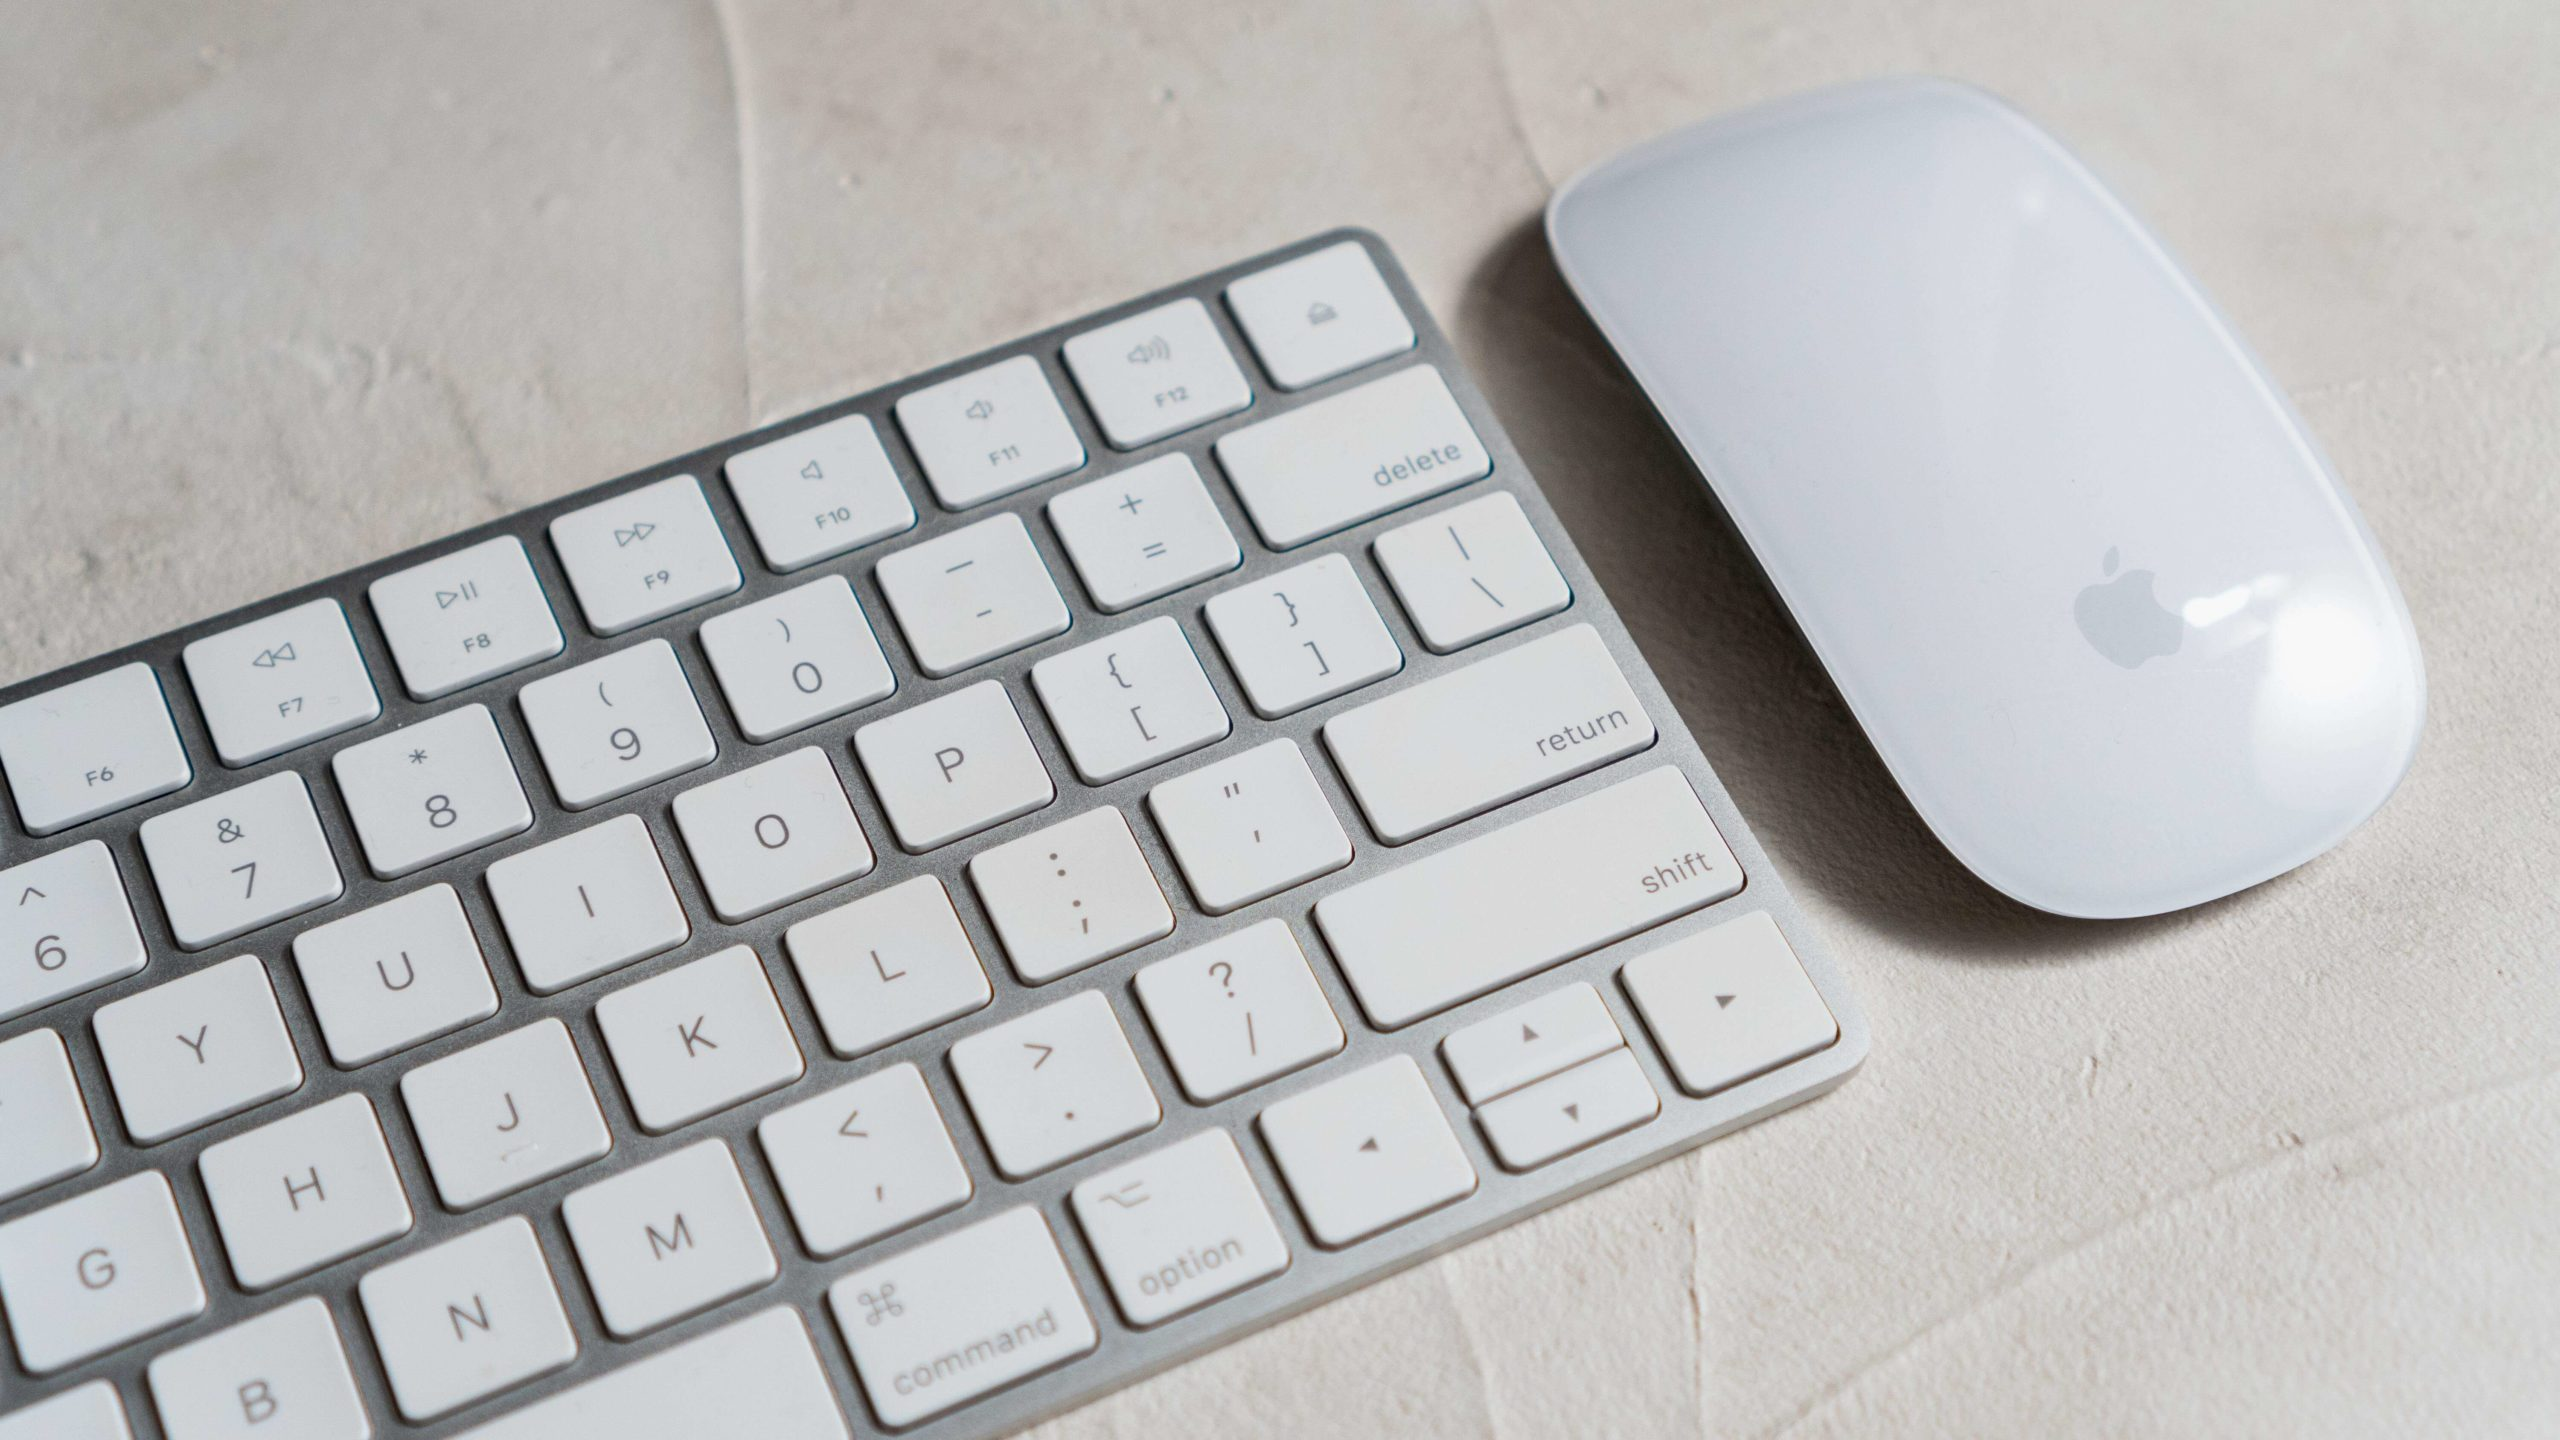 Appleキーボードとマウス